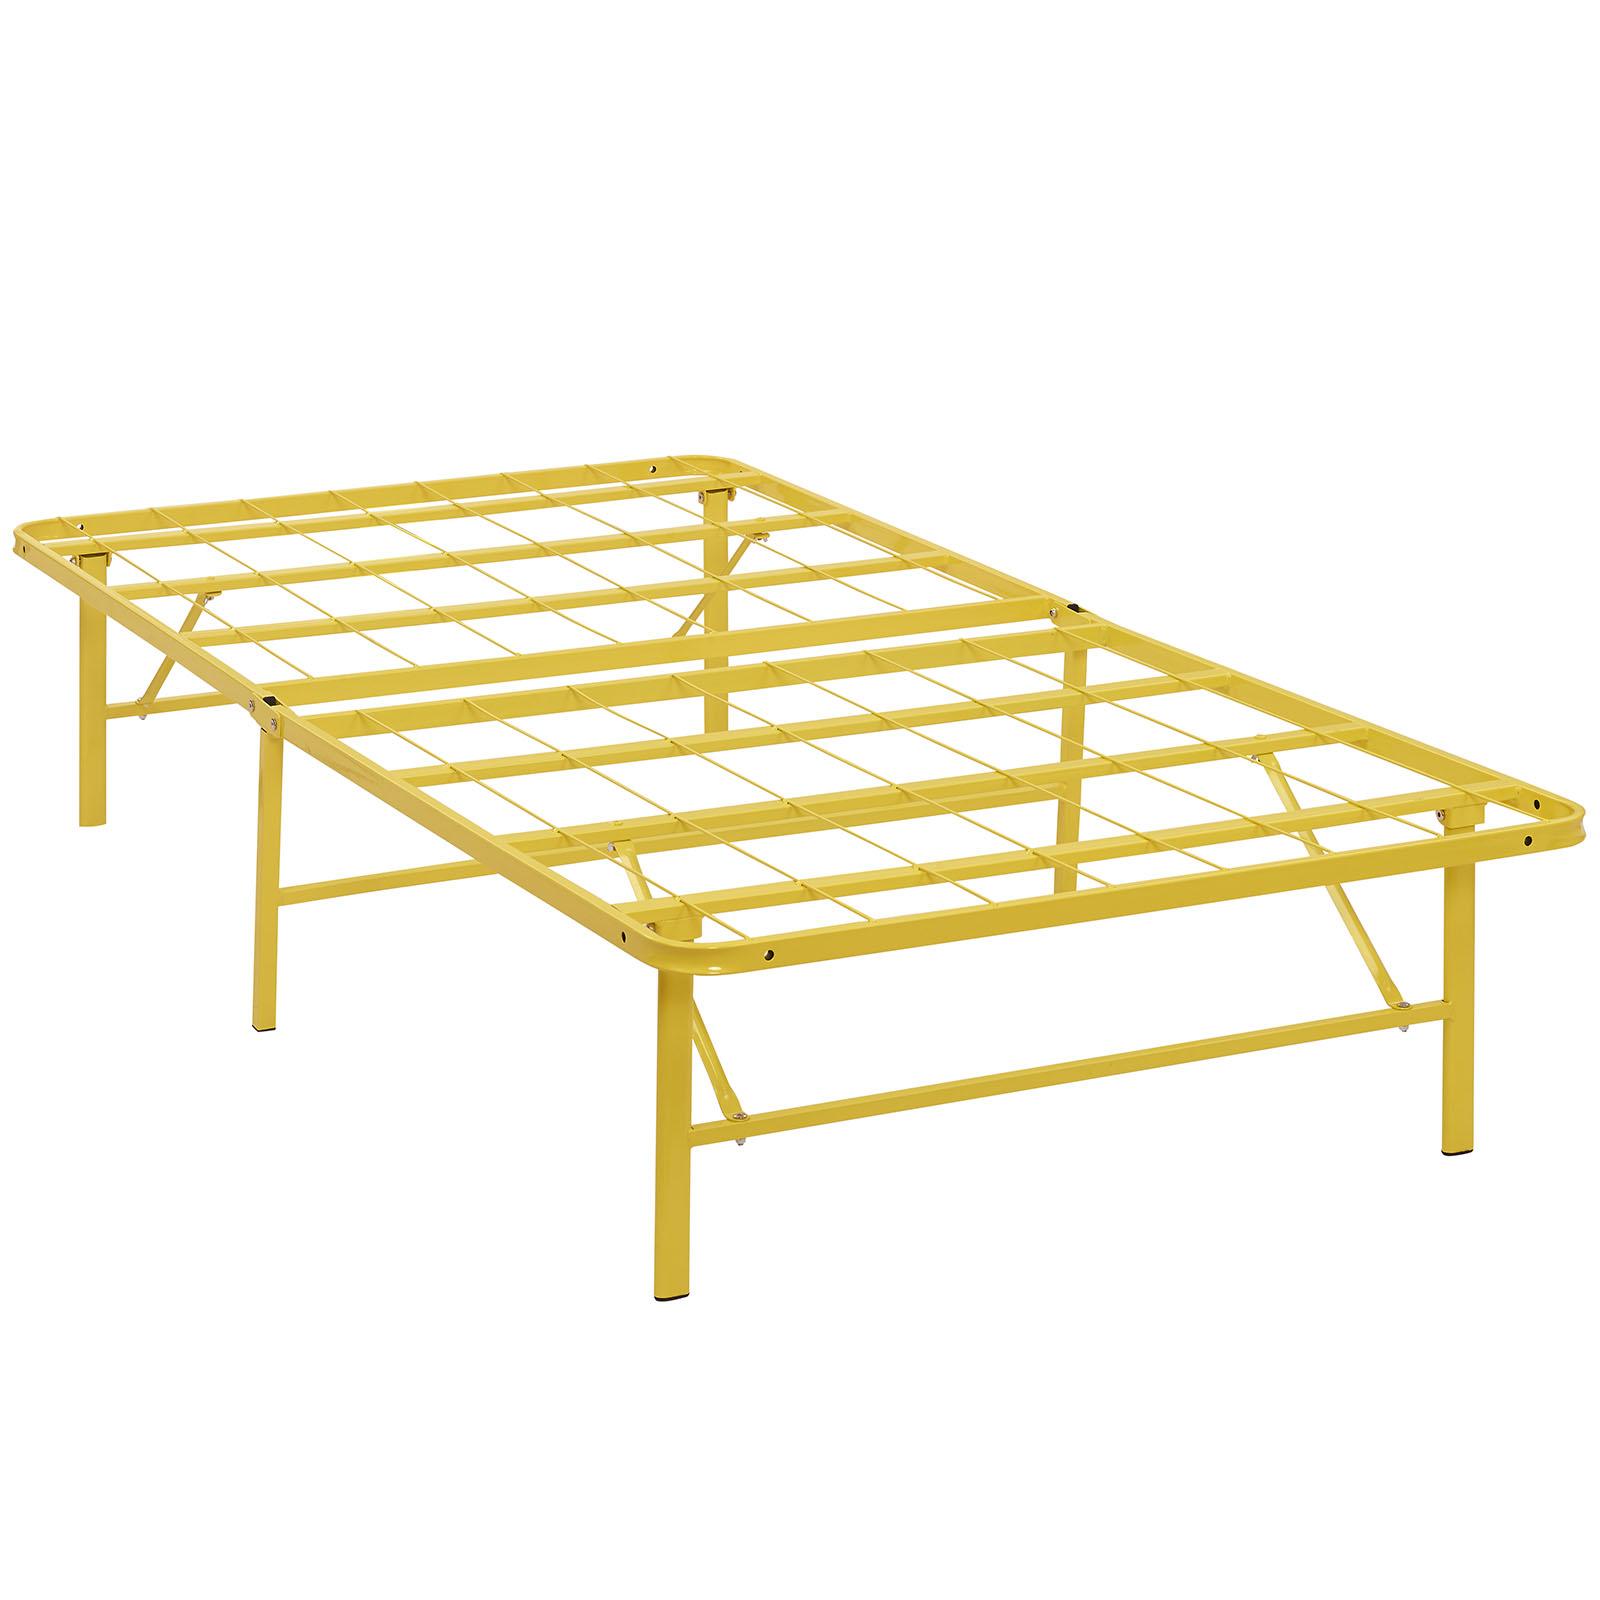 Modern Contemporary Urban Design Bedroom Twin Size Platform Bed Frame, Yellow, Metal Steel